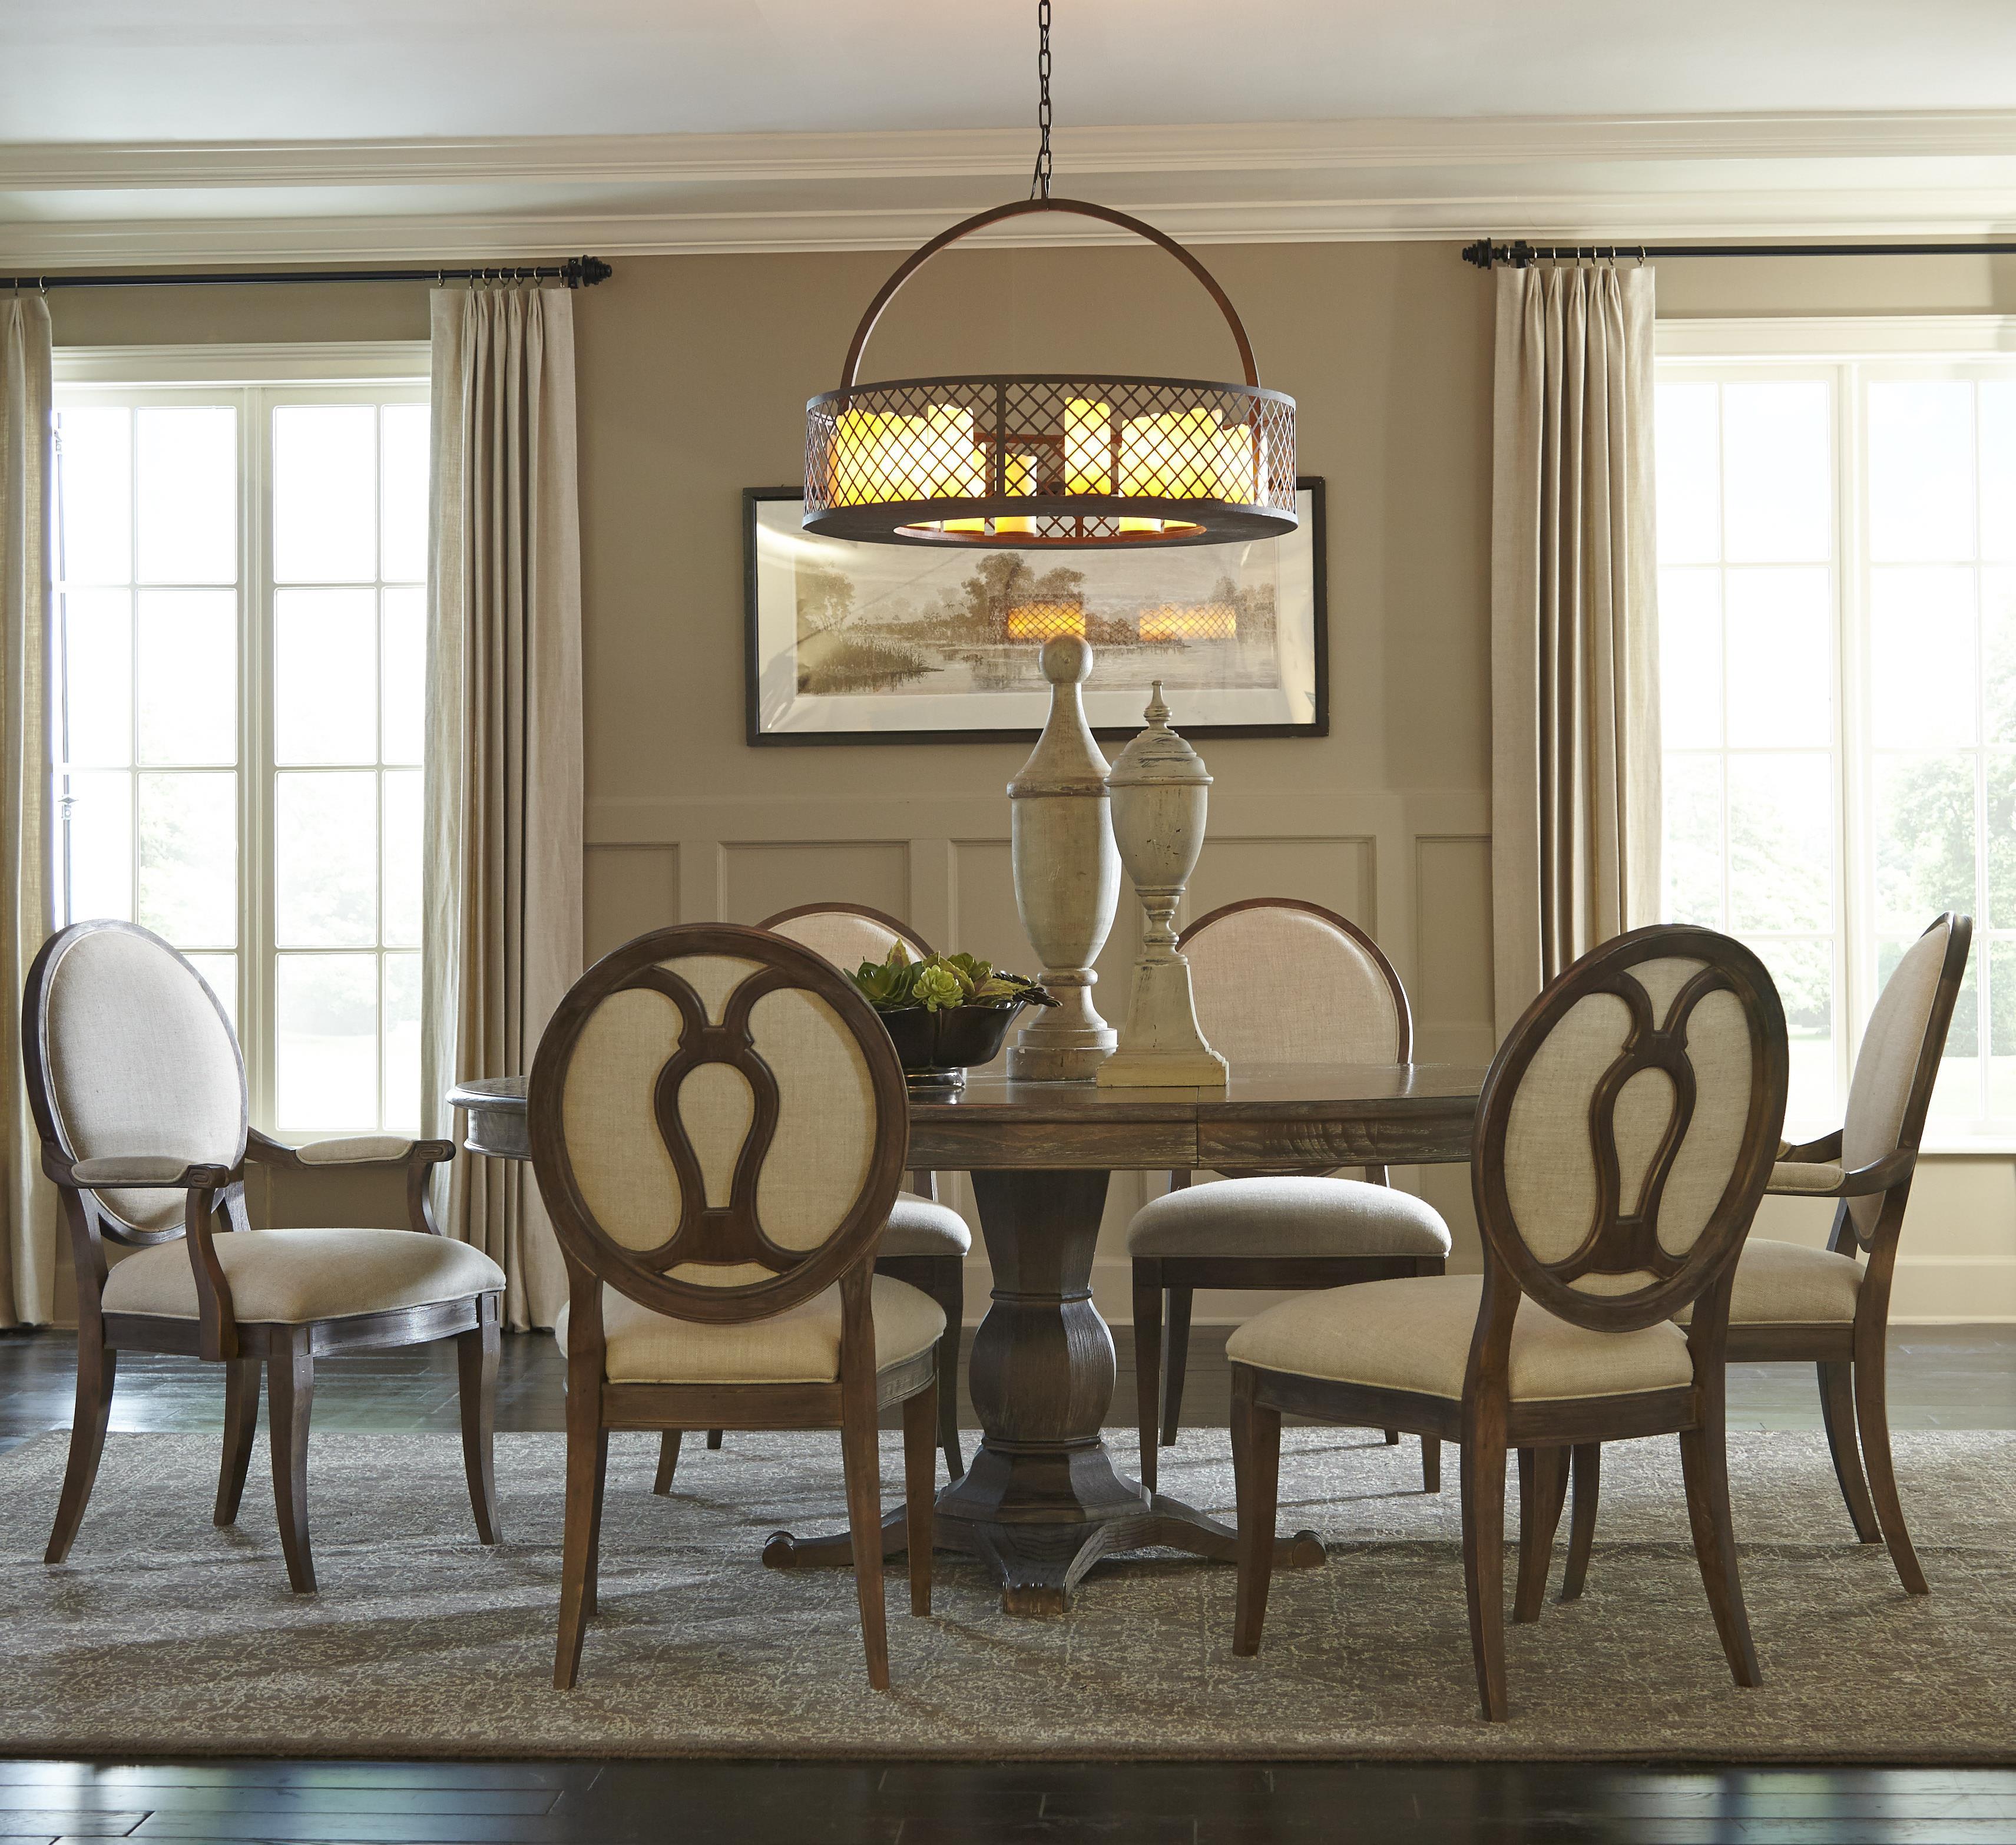 7 Piece Round Dining Table Set: Markor Furniture Saint Germain 7-Piece Round Dining Table